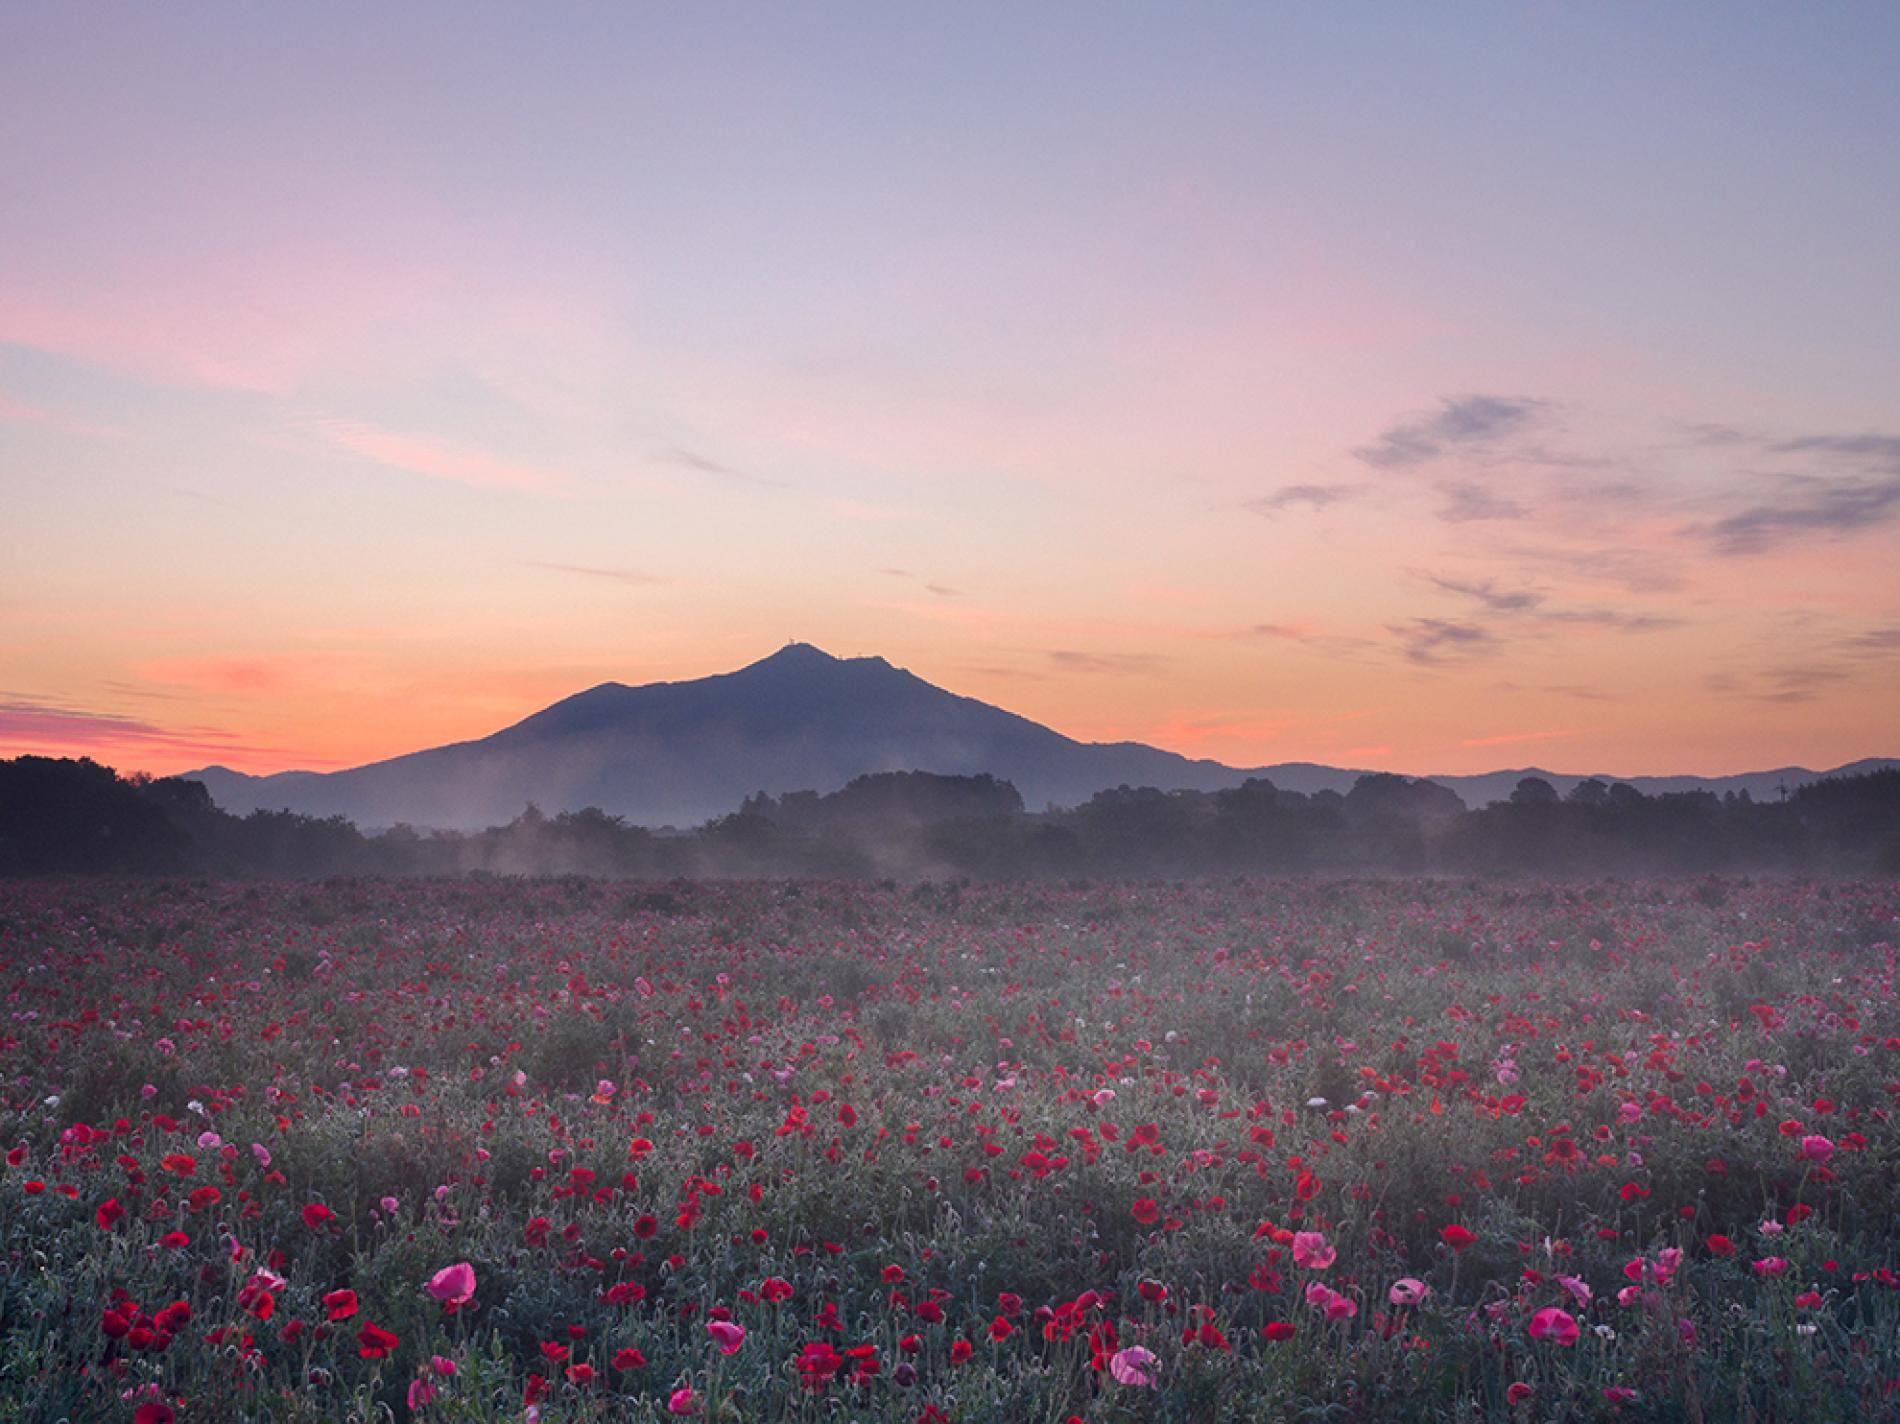 Mount Tsukuba Image Japan National Geographic Photo Of The Day Amazing Nature Photography Nature Photography National Geographic Photos